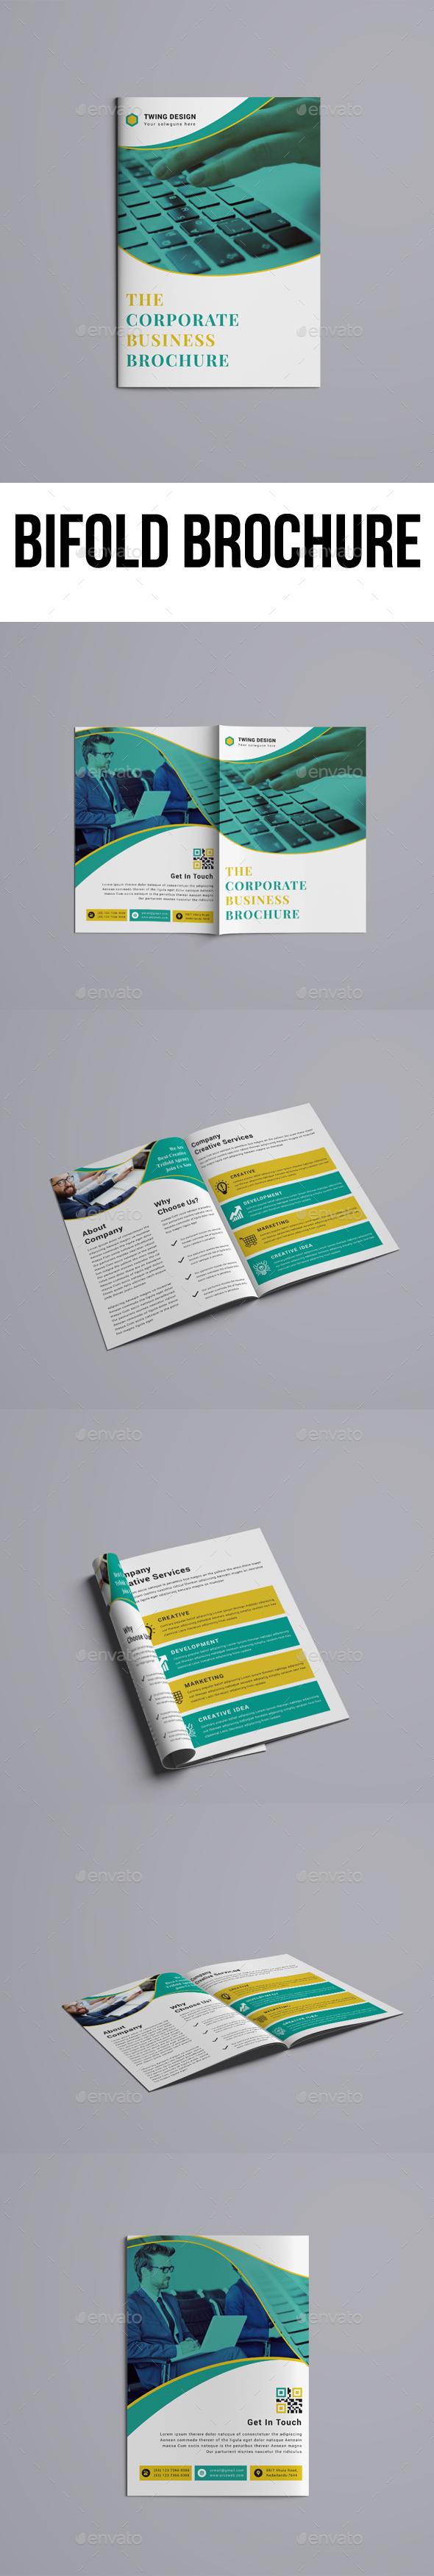 GraphicRiver Bifold Brochure 21160501